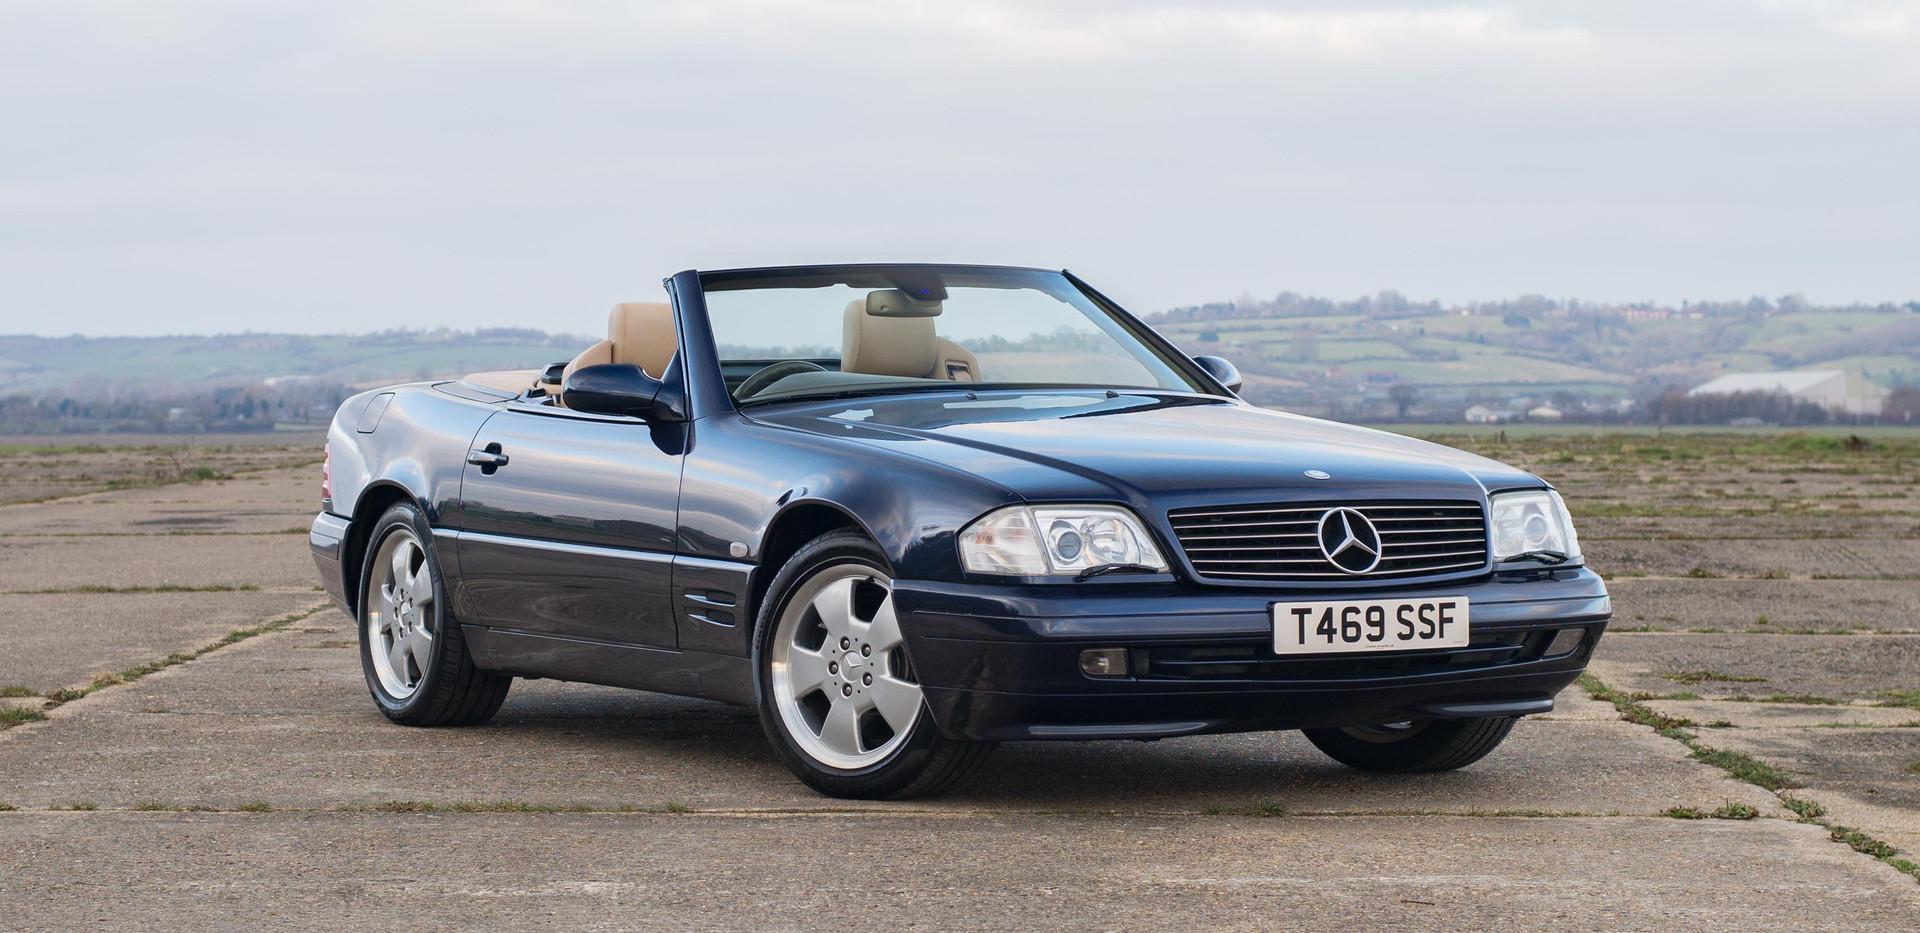 SL500 For Sale UK London  (3 of 36).jpg